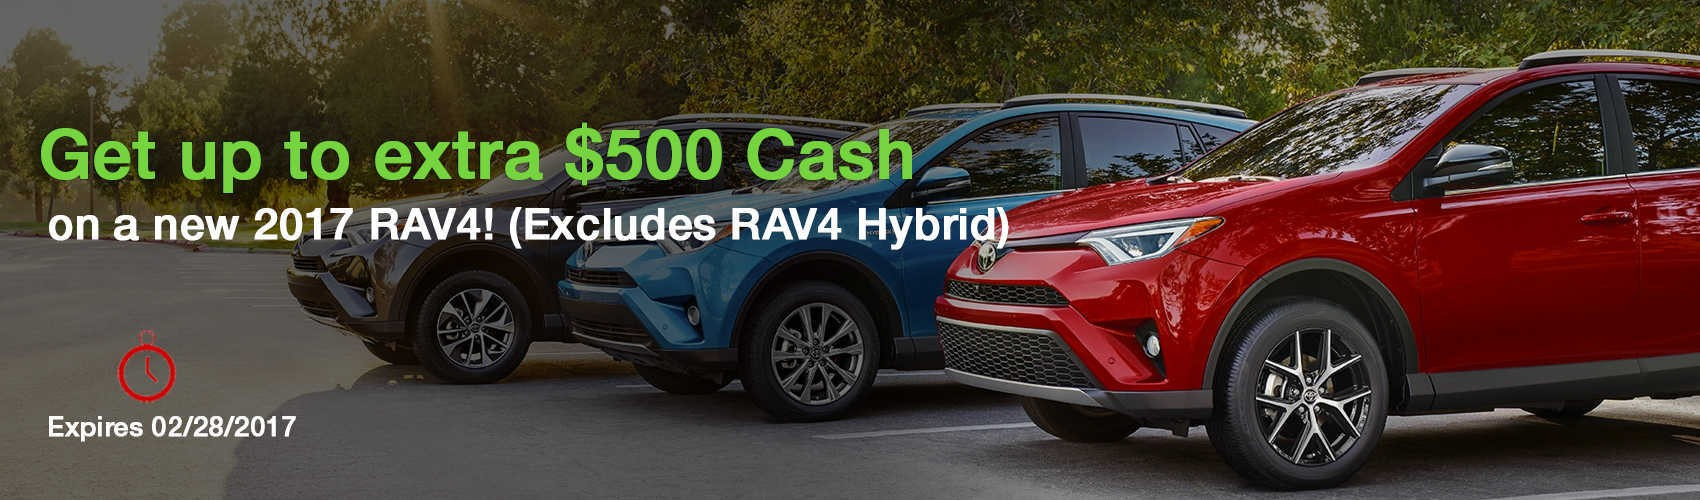 2017 RAV4 cars